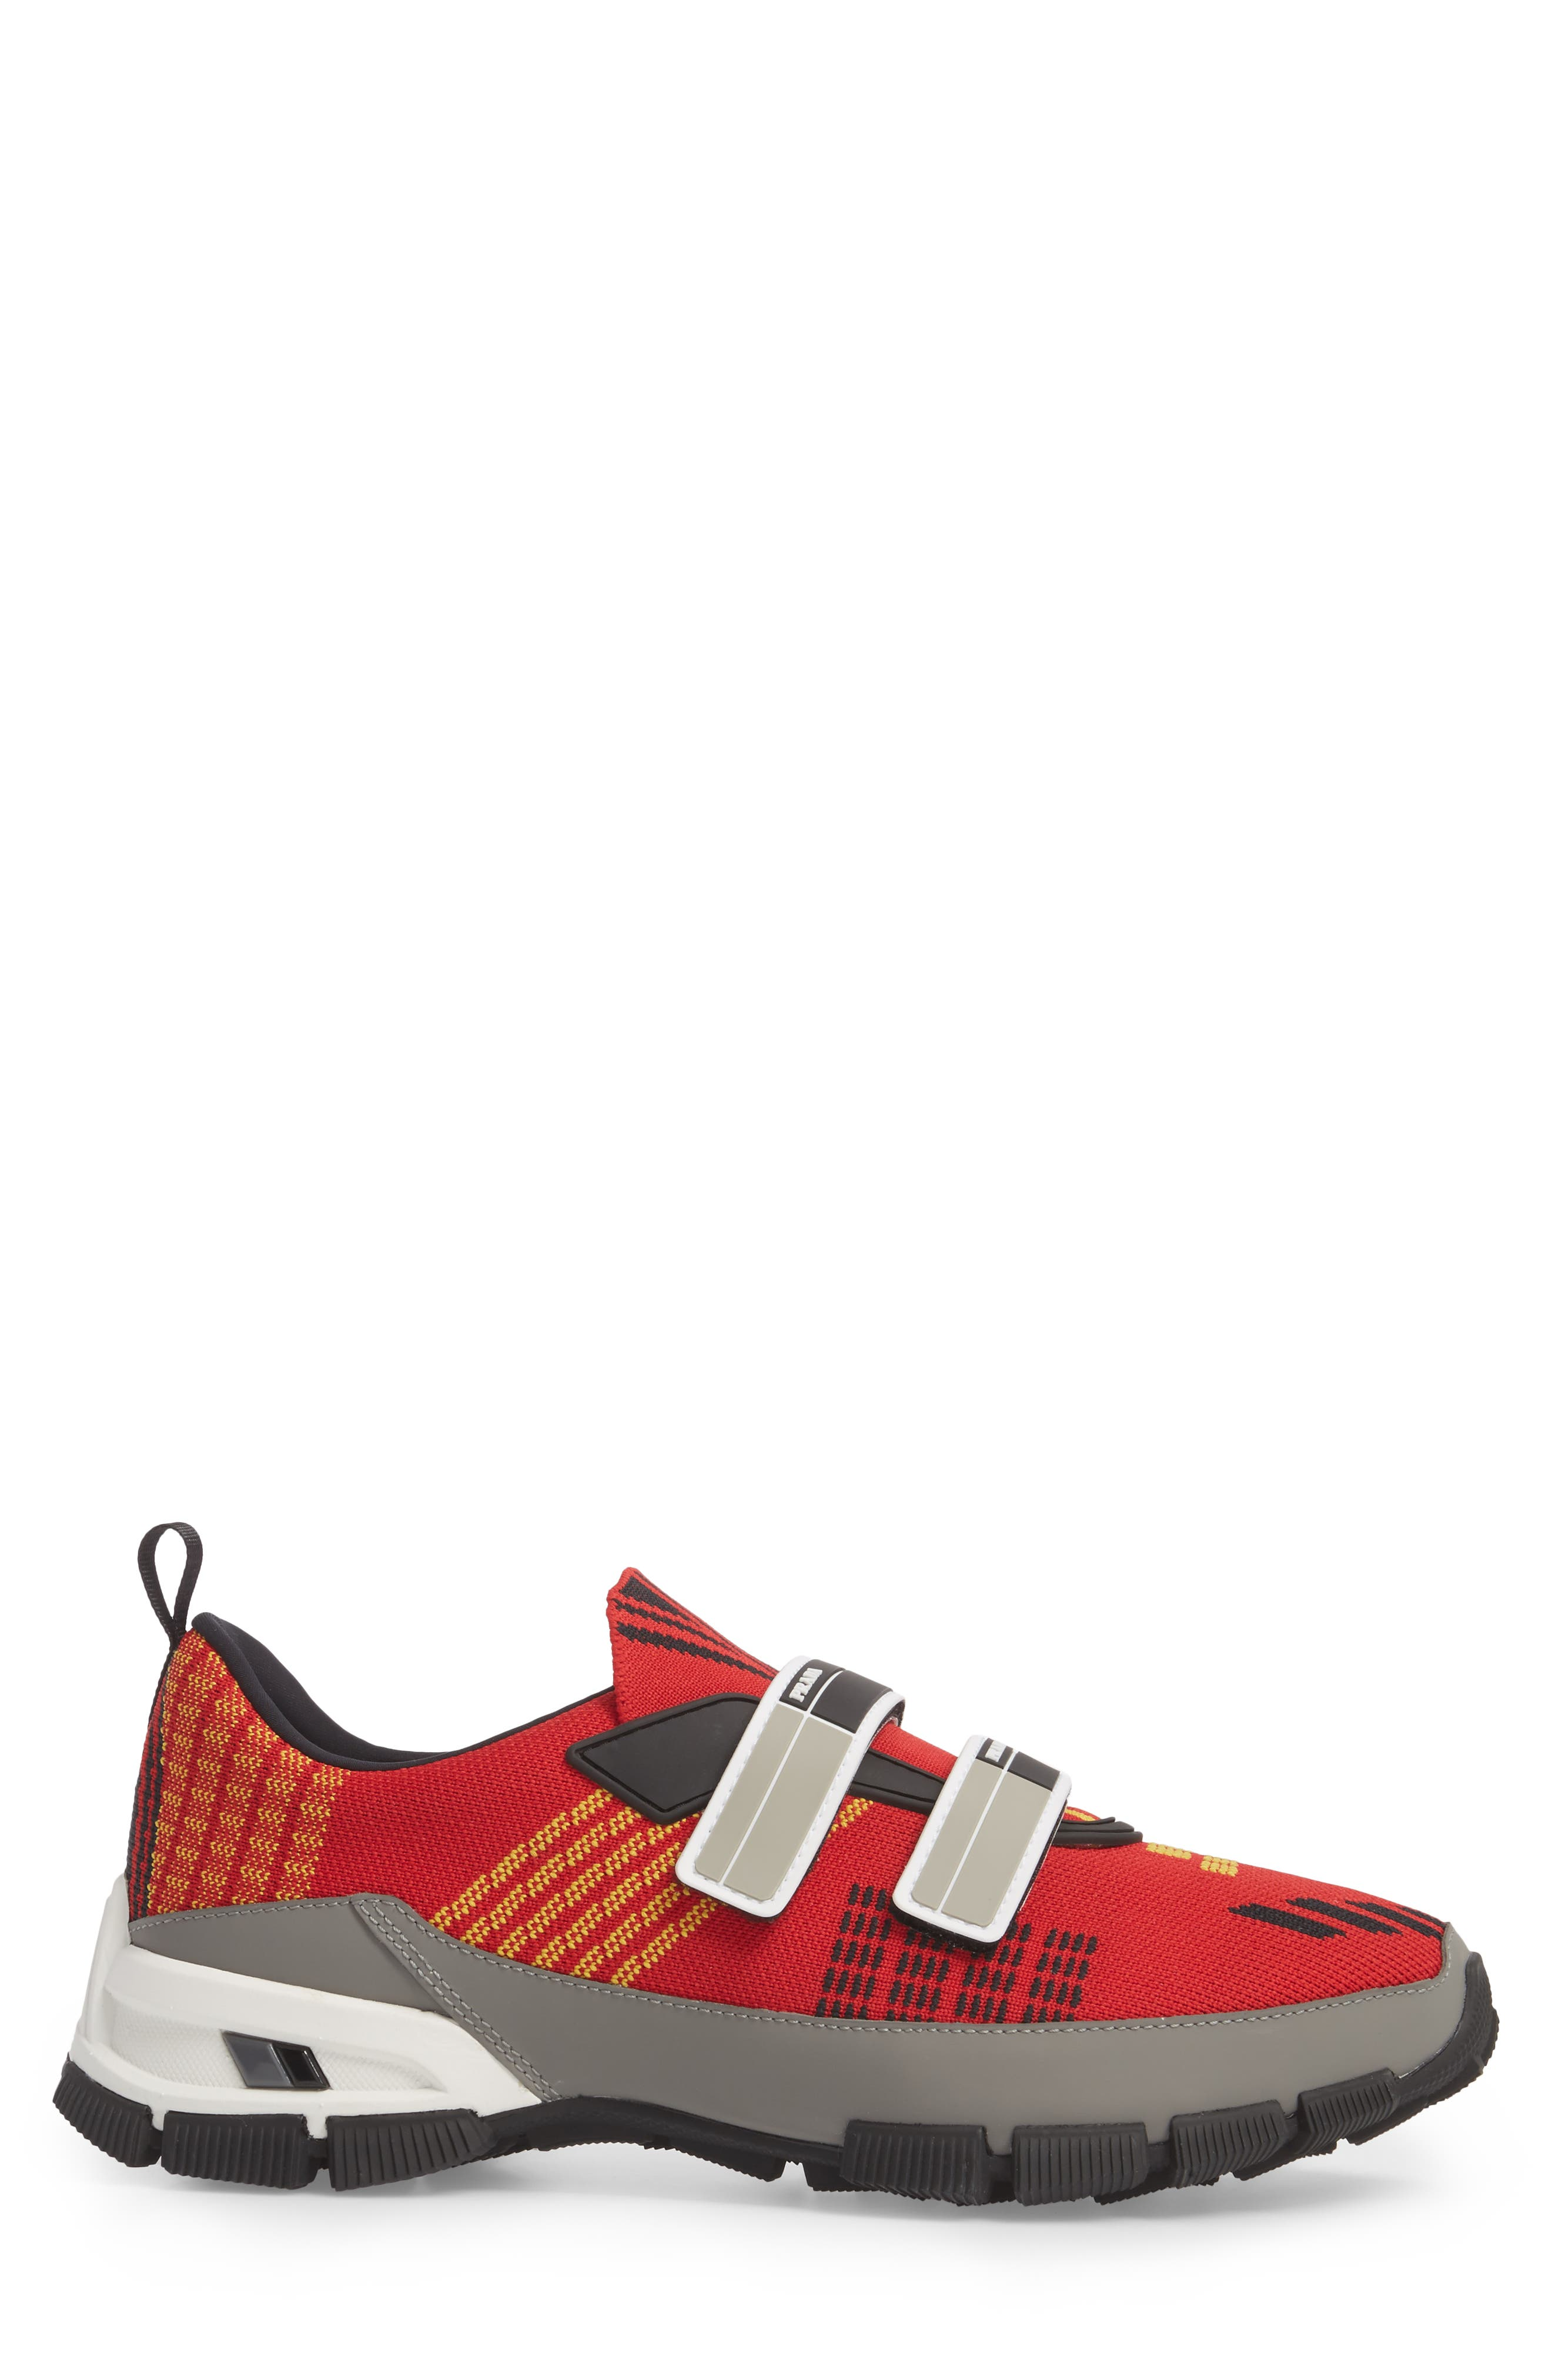 Linea Rossa Strap Sneaker,                             Alternate thumbnail 6, color,